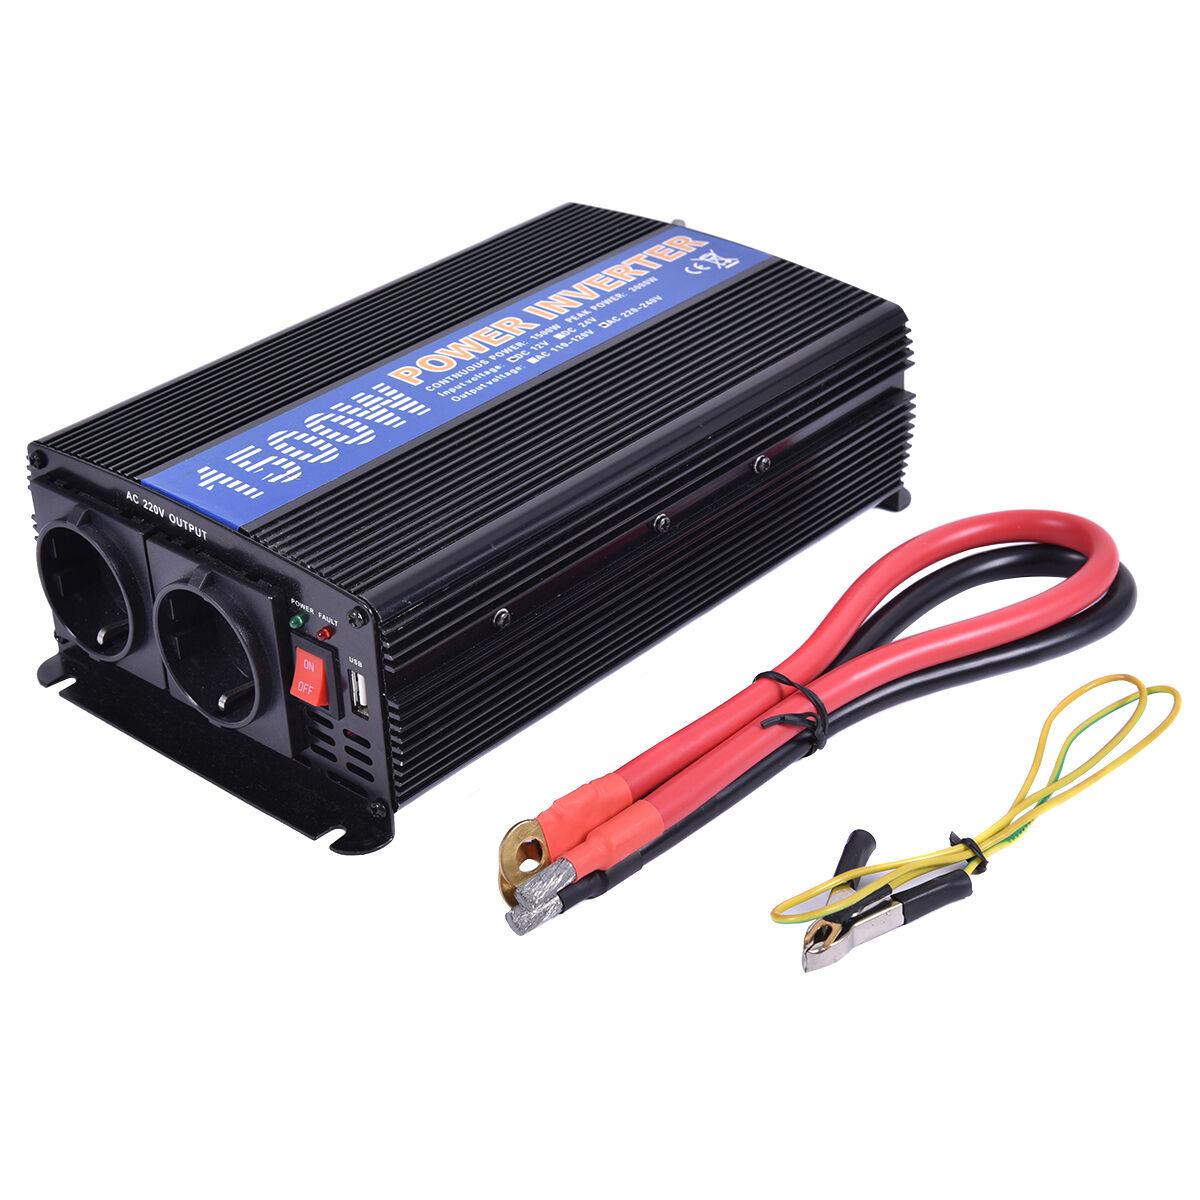 Spannungswandler 1500 3000W Inverter Welchselrichter 12V auf 220/230V